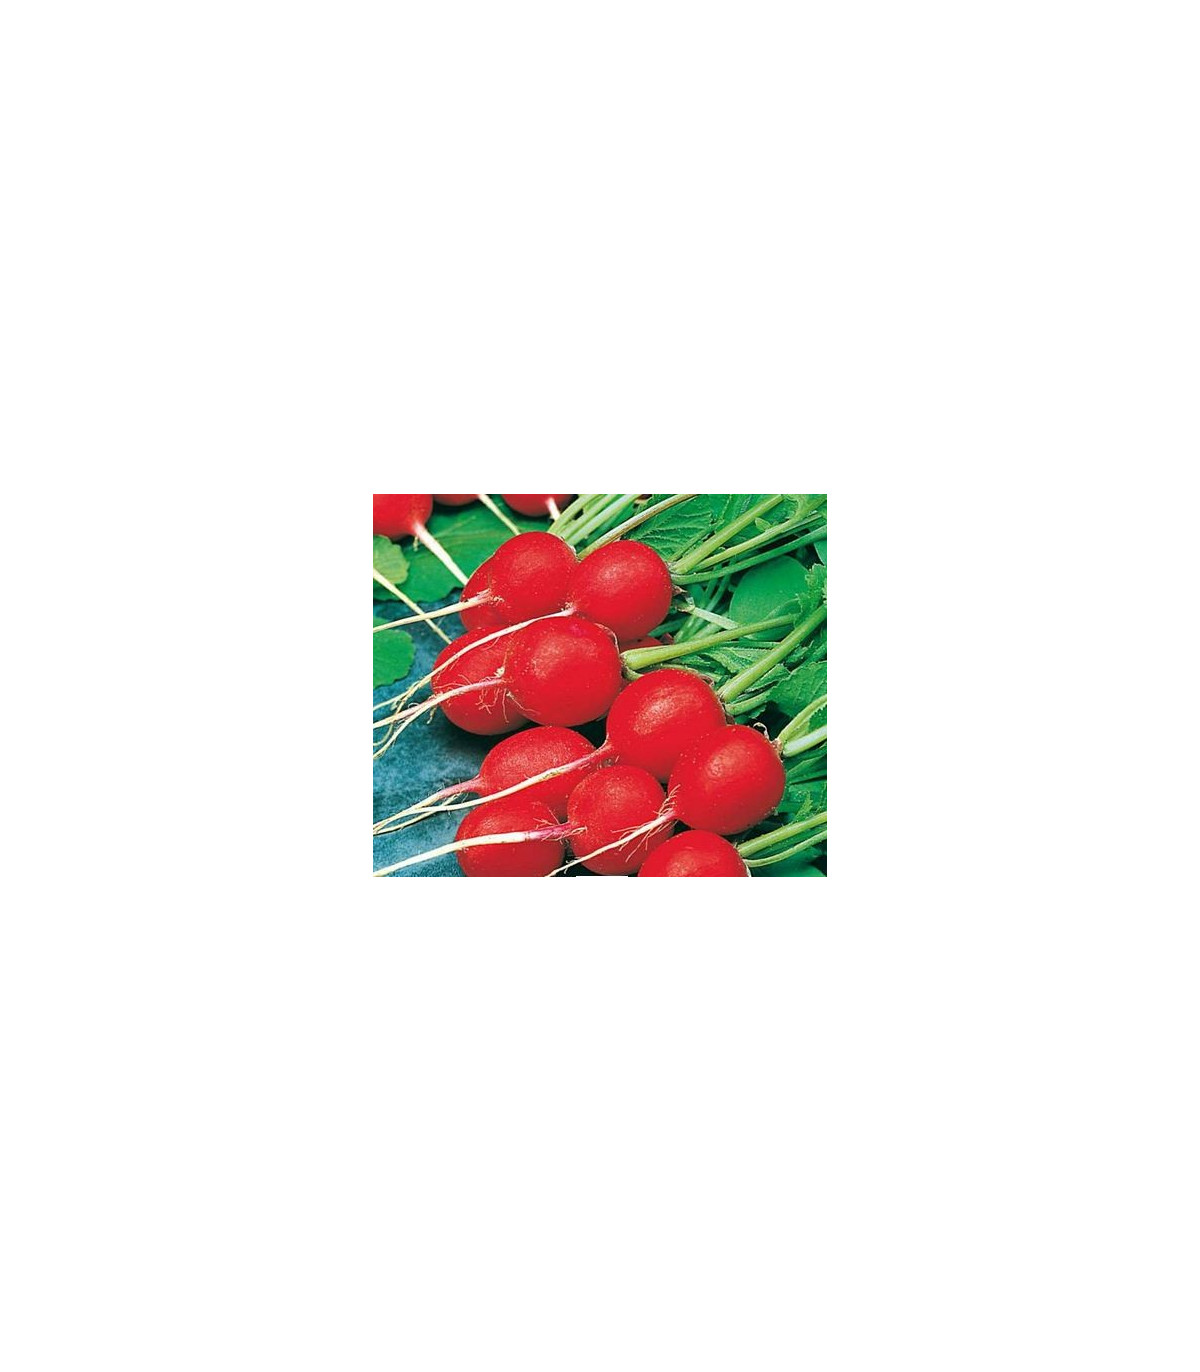 Ředkvička Ilka - prodej semen ředkvičky - Rahanus sativus - osivo - 50 ks